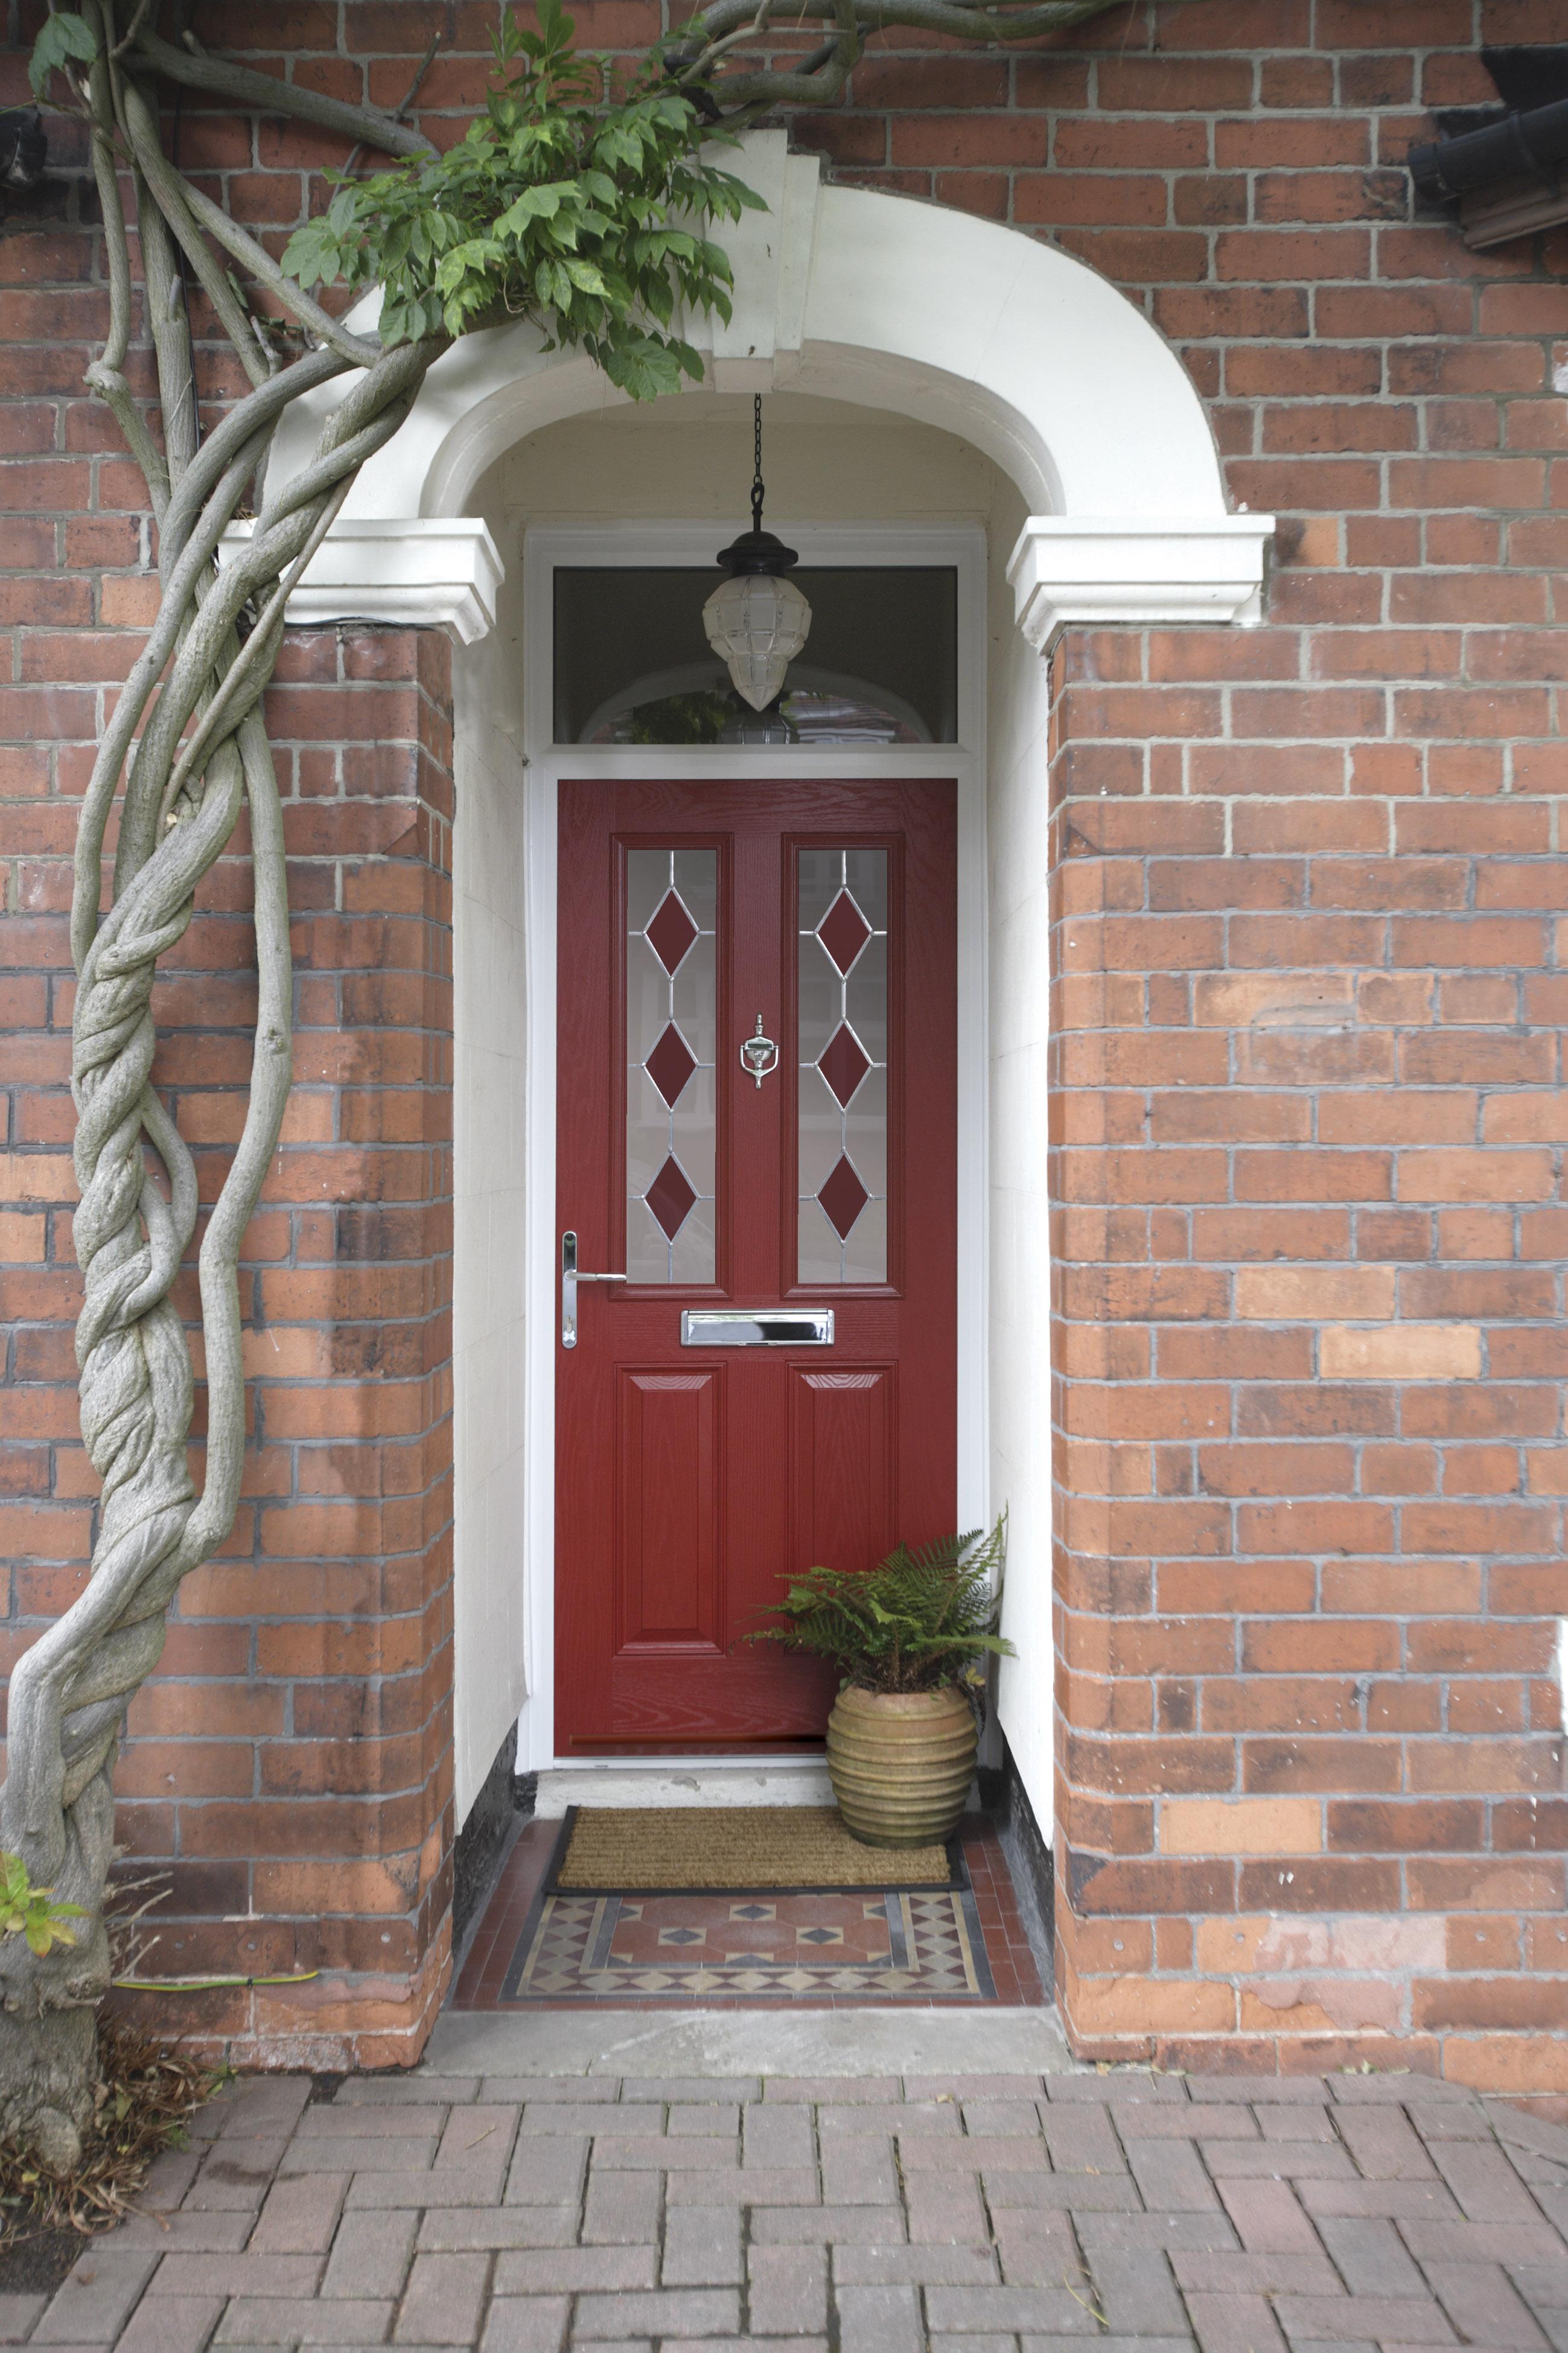 Residential External Doors From Woodstock In North Devon